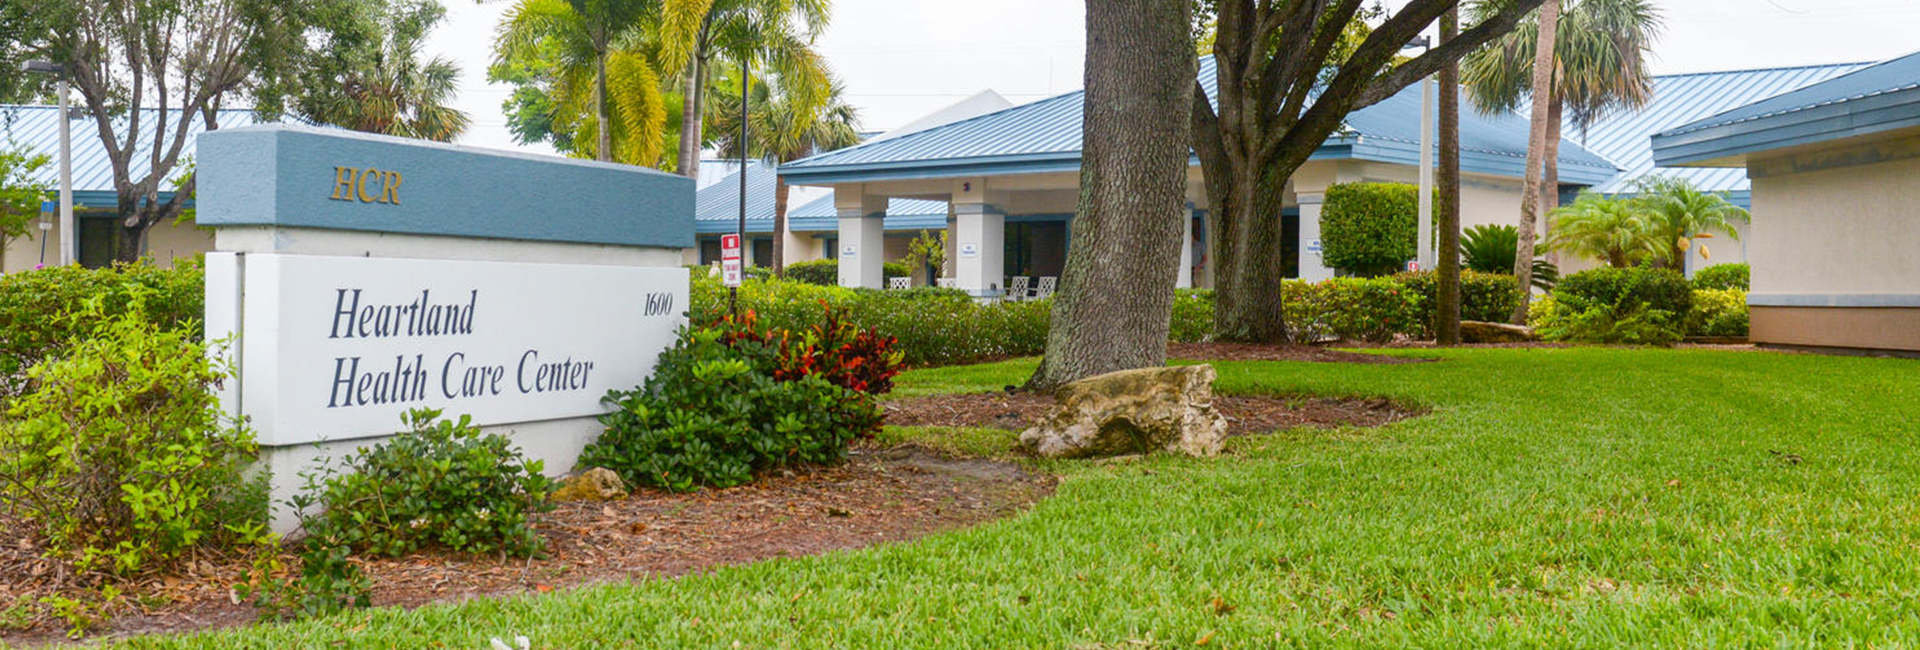 Heartland Health Care Center Ft Myers Heartland Manorcare